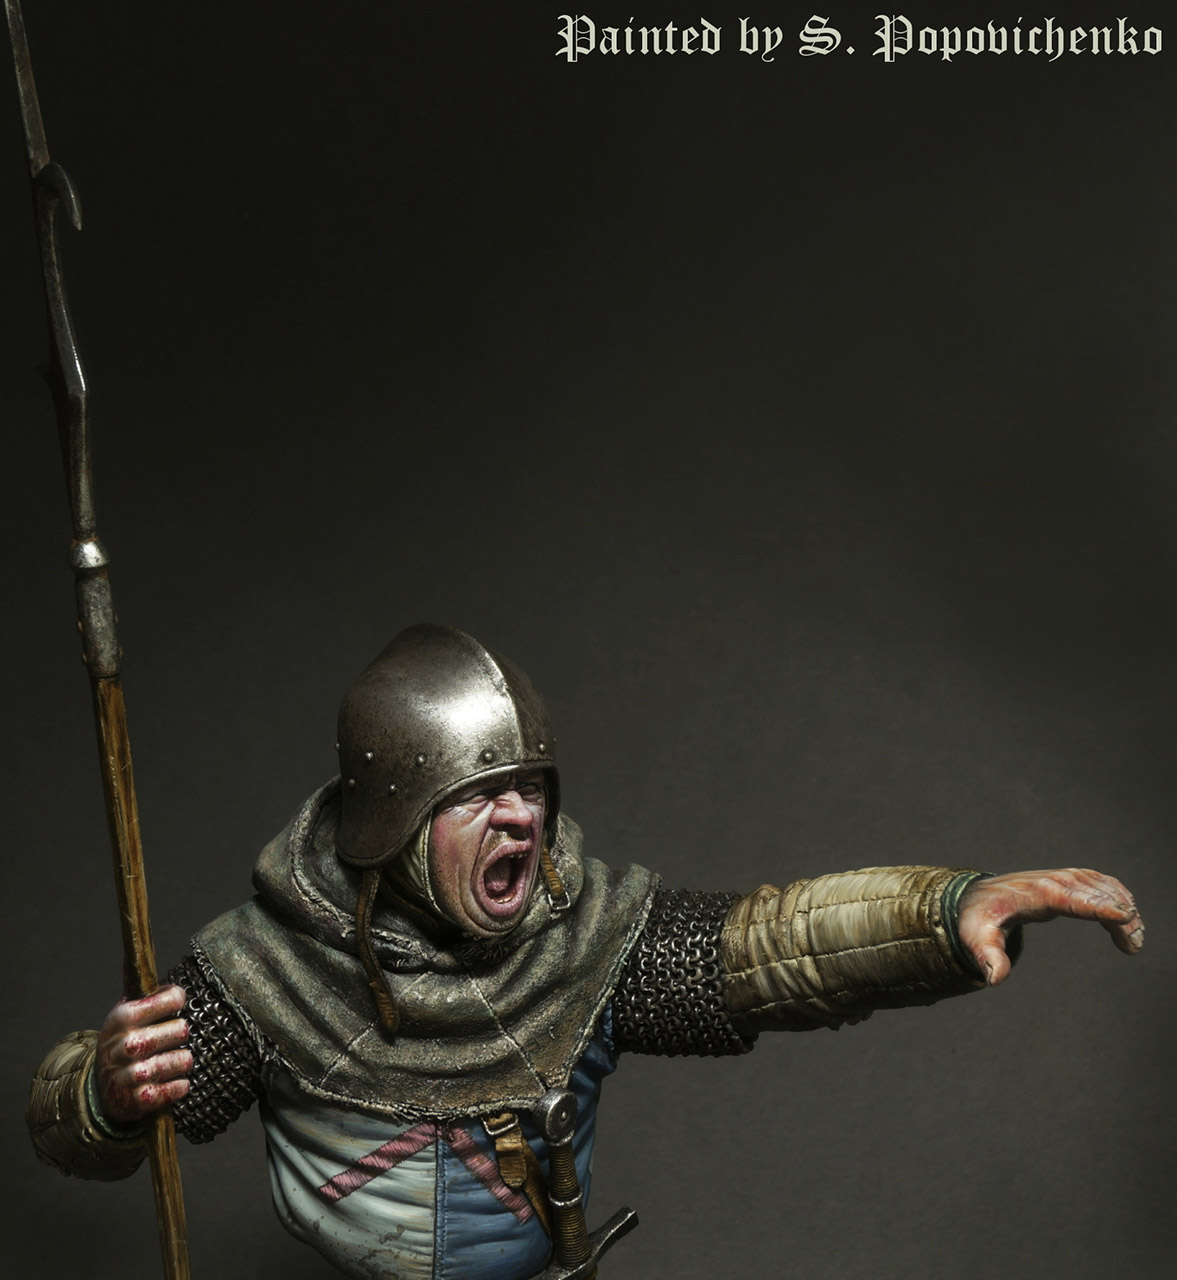 Figures: Medieval infantryman, photo #1